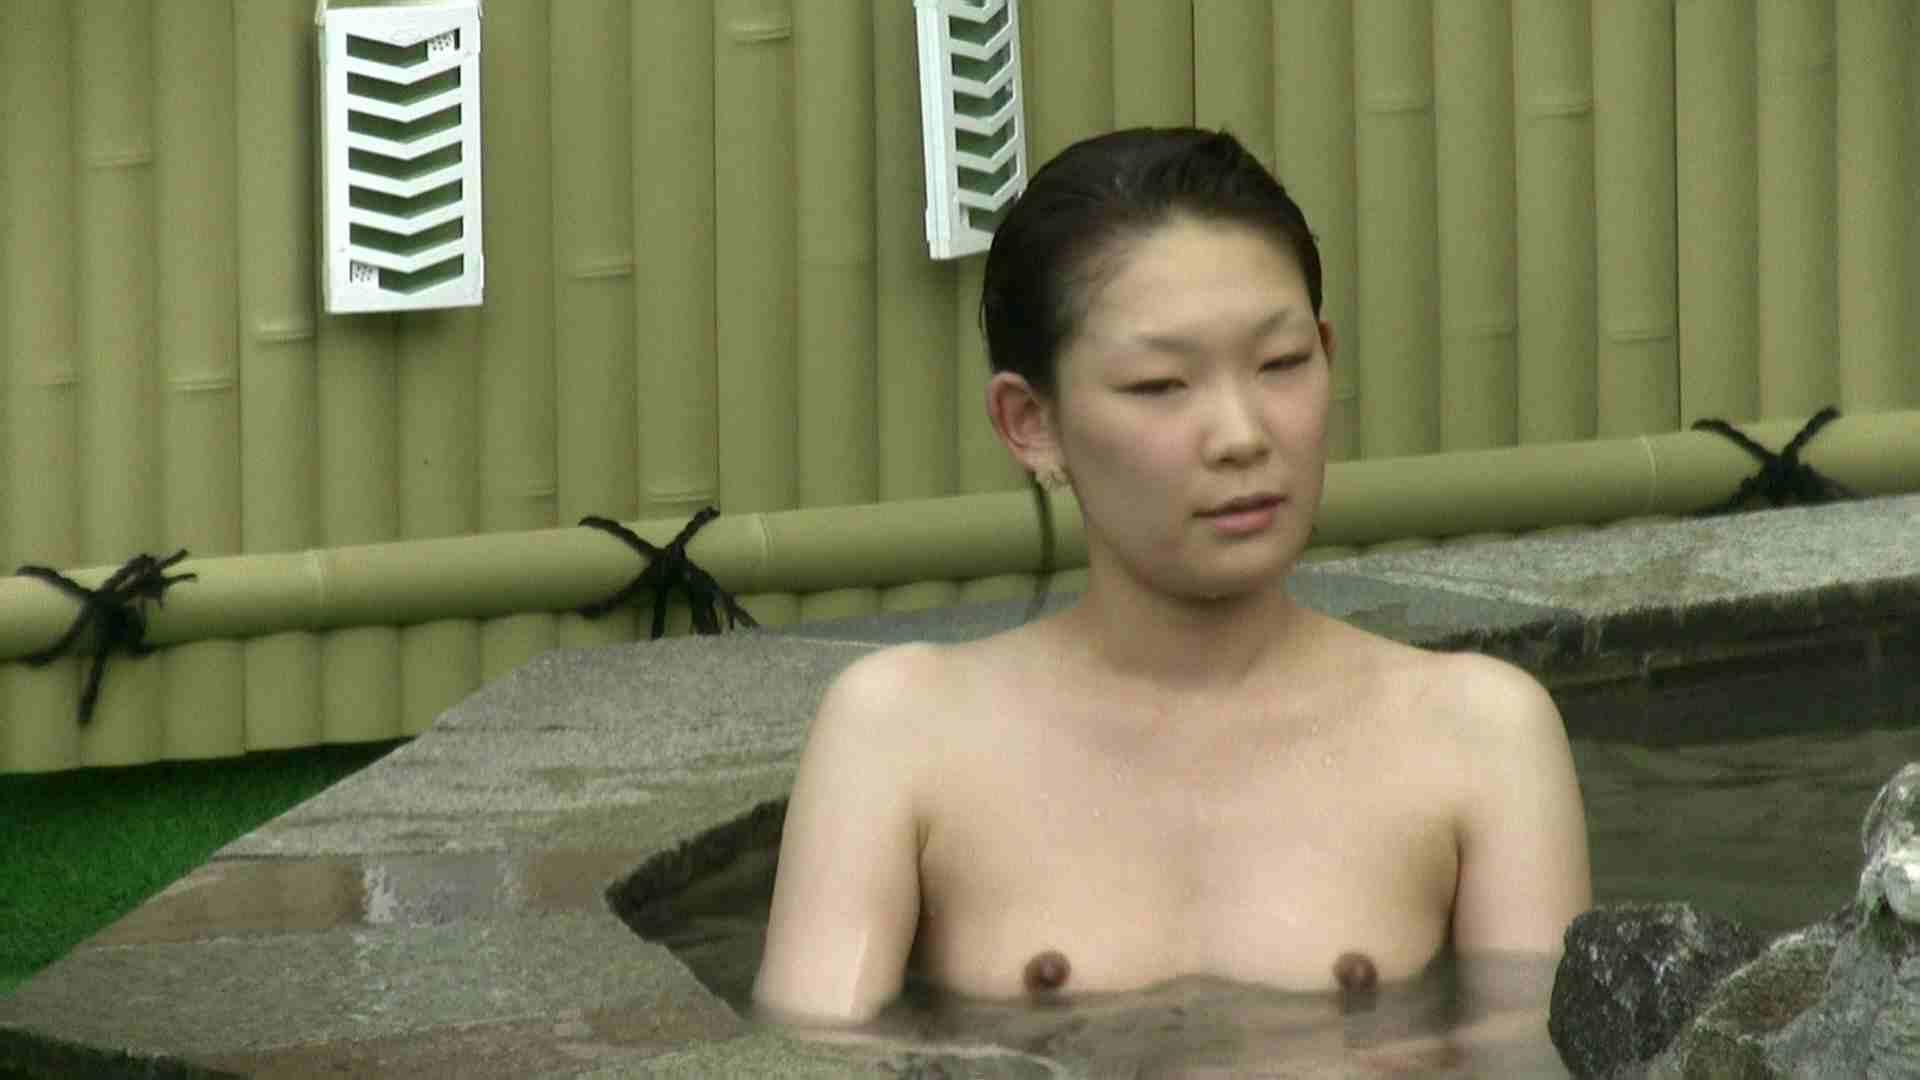 Aquaな露天風呂Vol.670 0 | 0  81連発 6